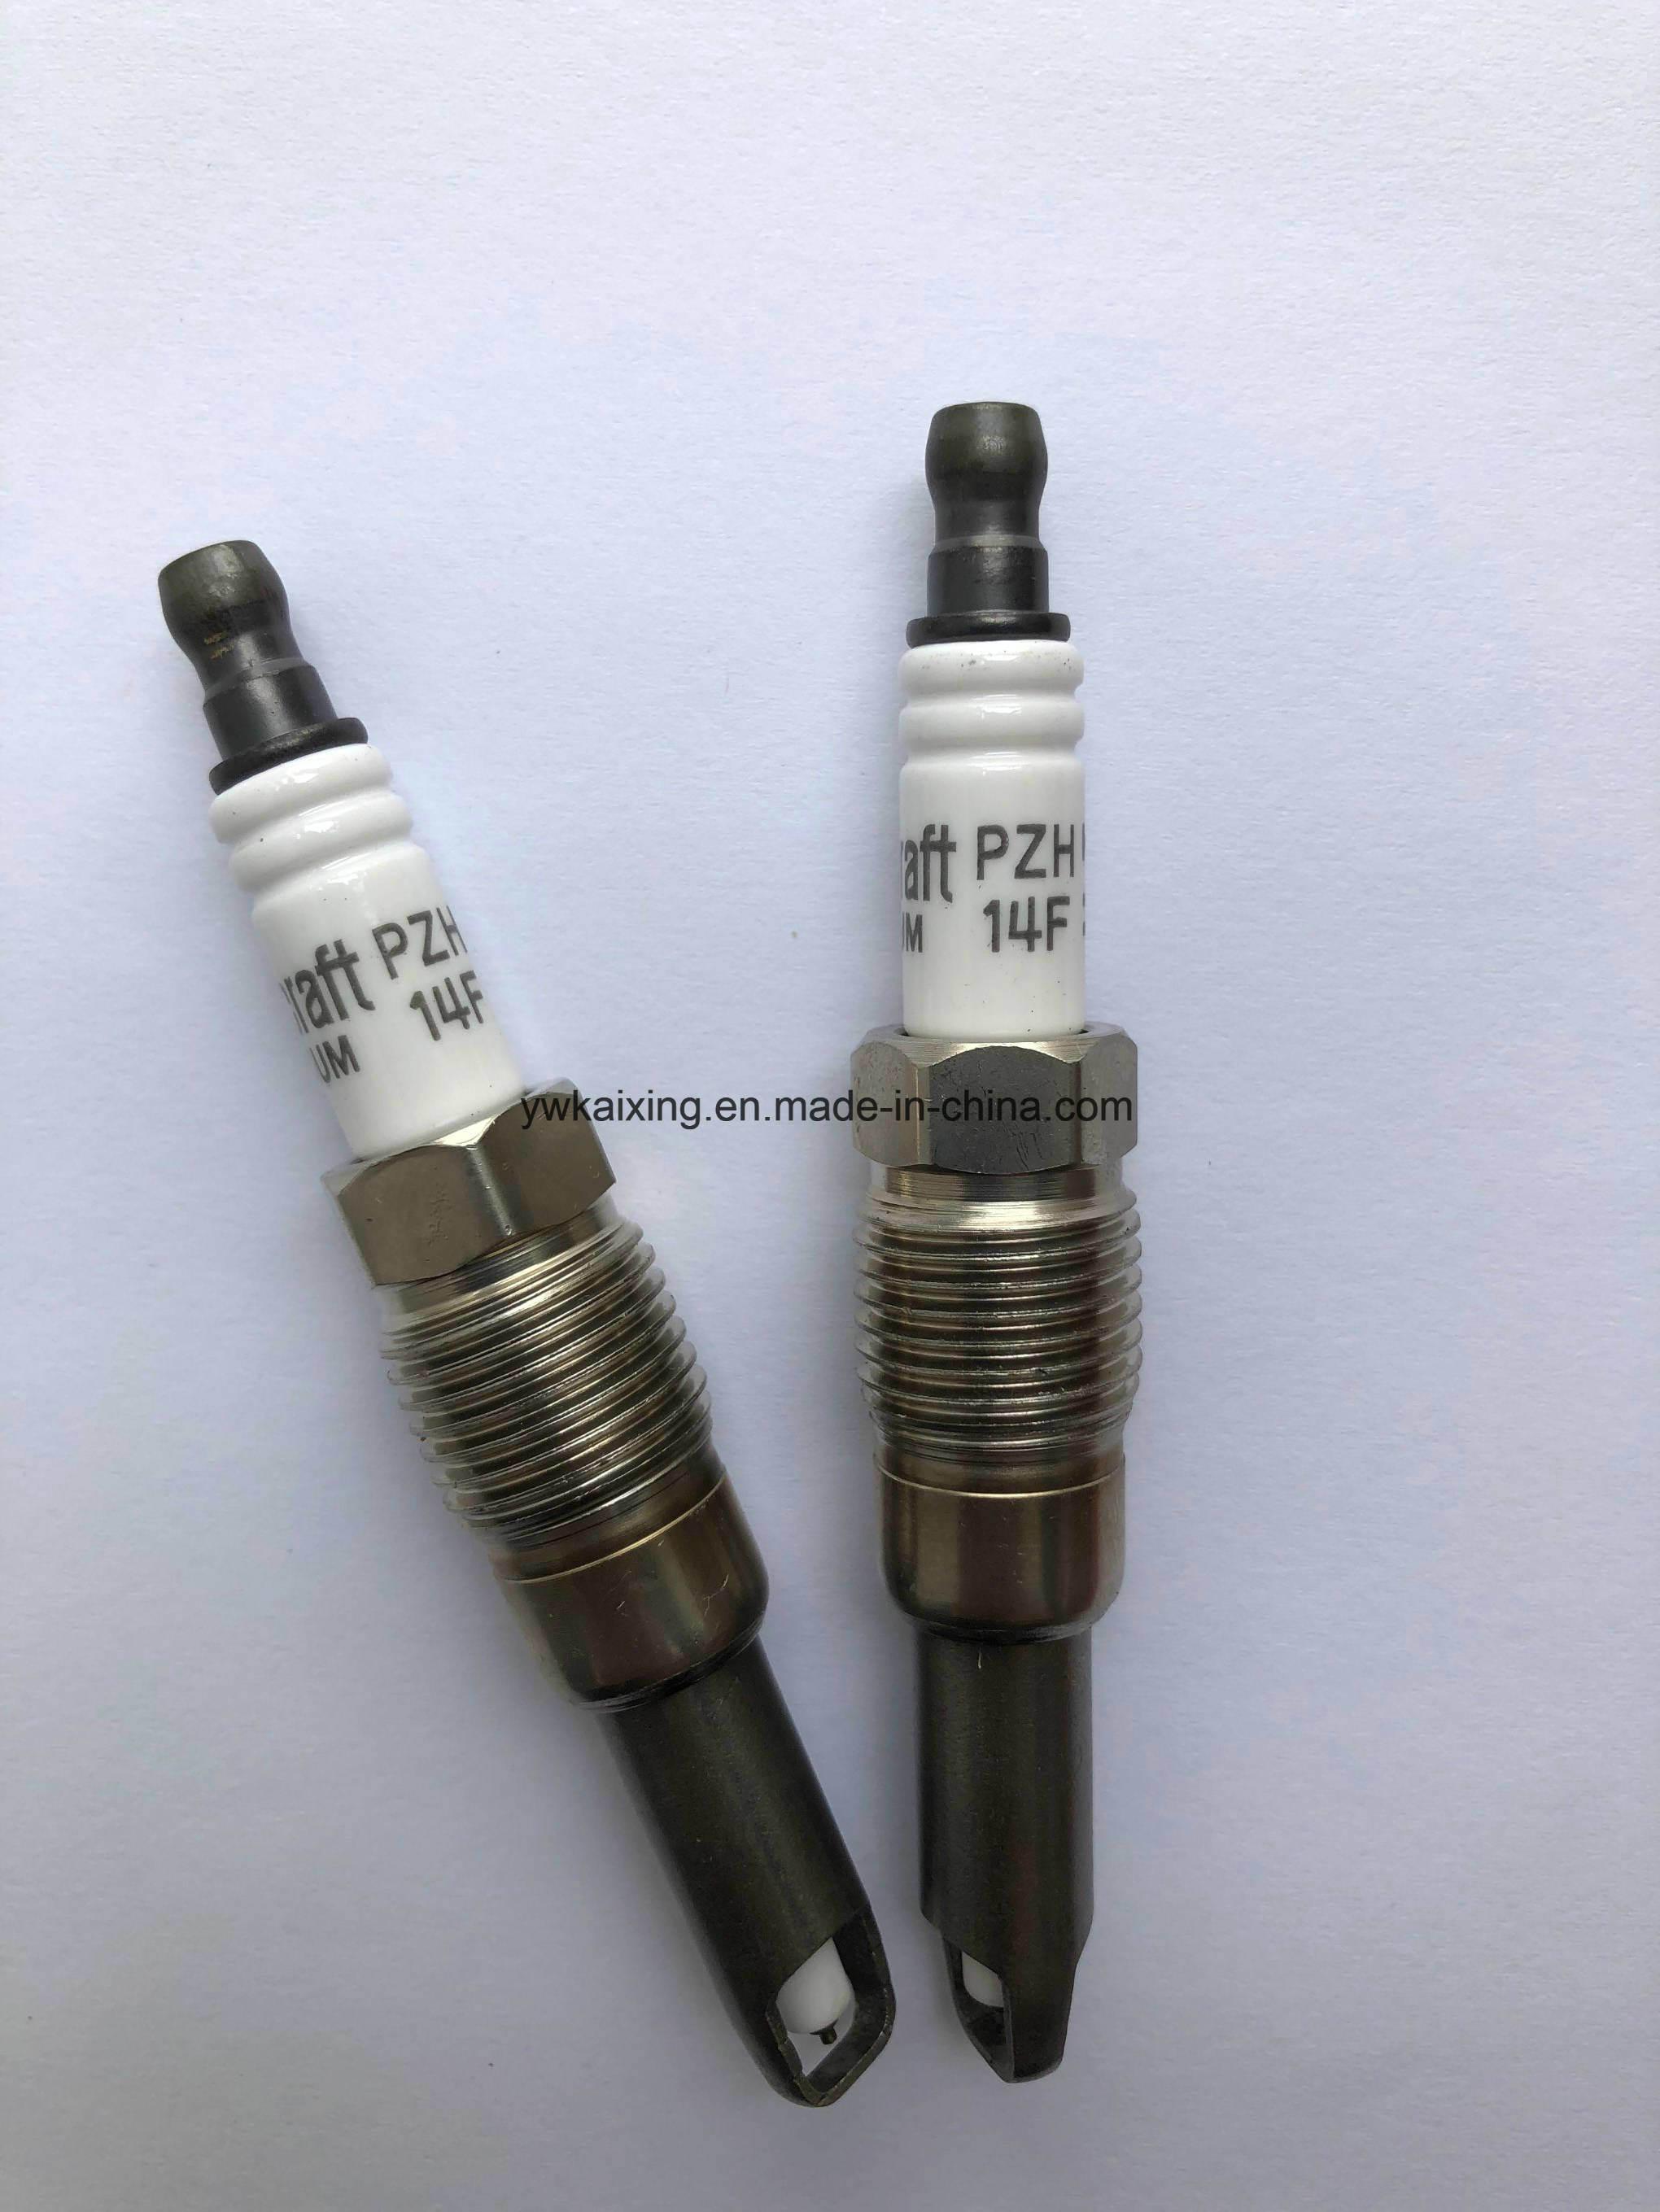 China Motorcraft Spark Plugs Sp515 Ford F 150 250 54l 3v Update 2000 Plug Coil F150 5 4 Pzh14f